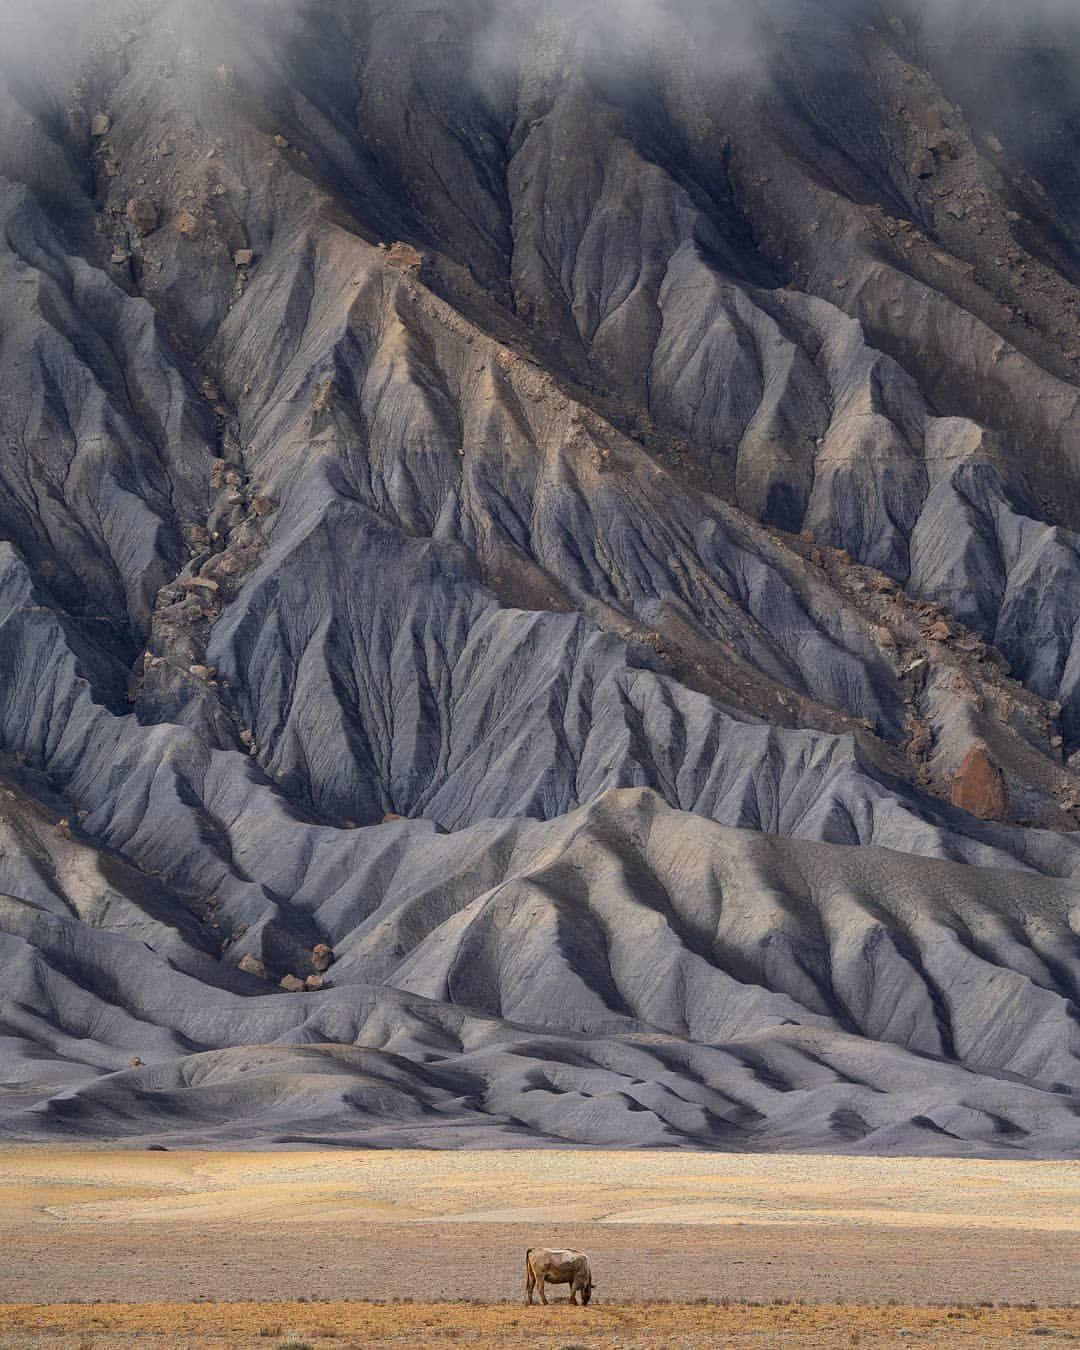 Monumental Fine Art Landscape Photography By Dustin Lefevre Fine Art Landscape Fine Art Landscape Photography Landscape Photography